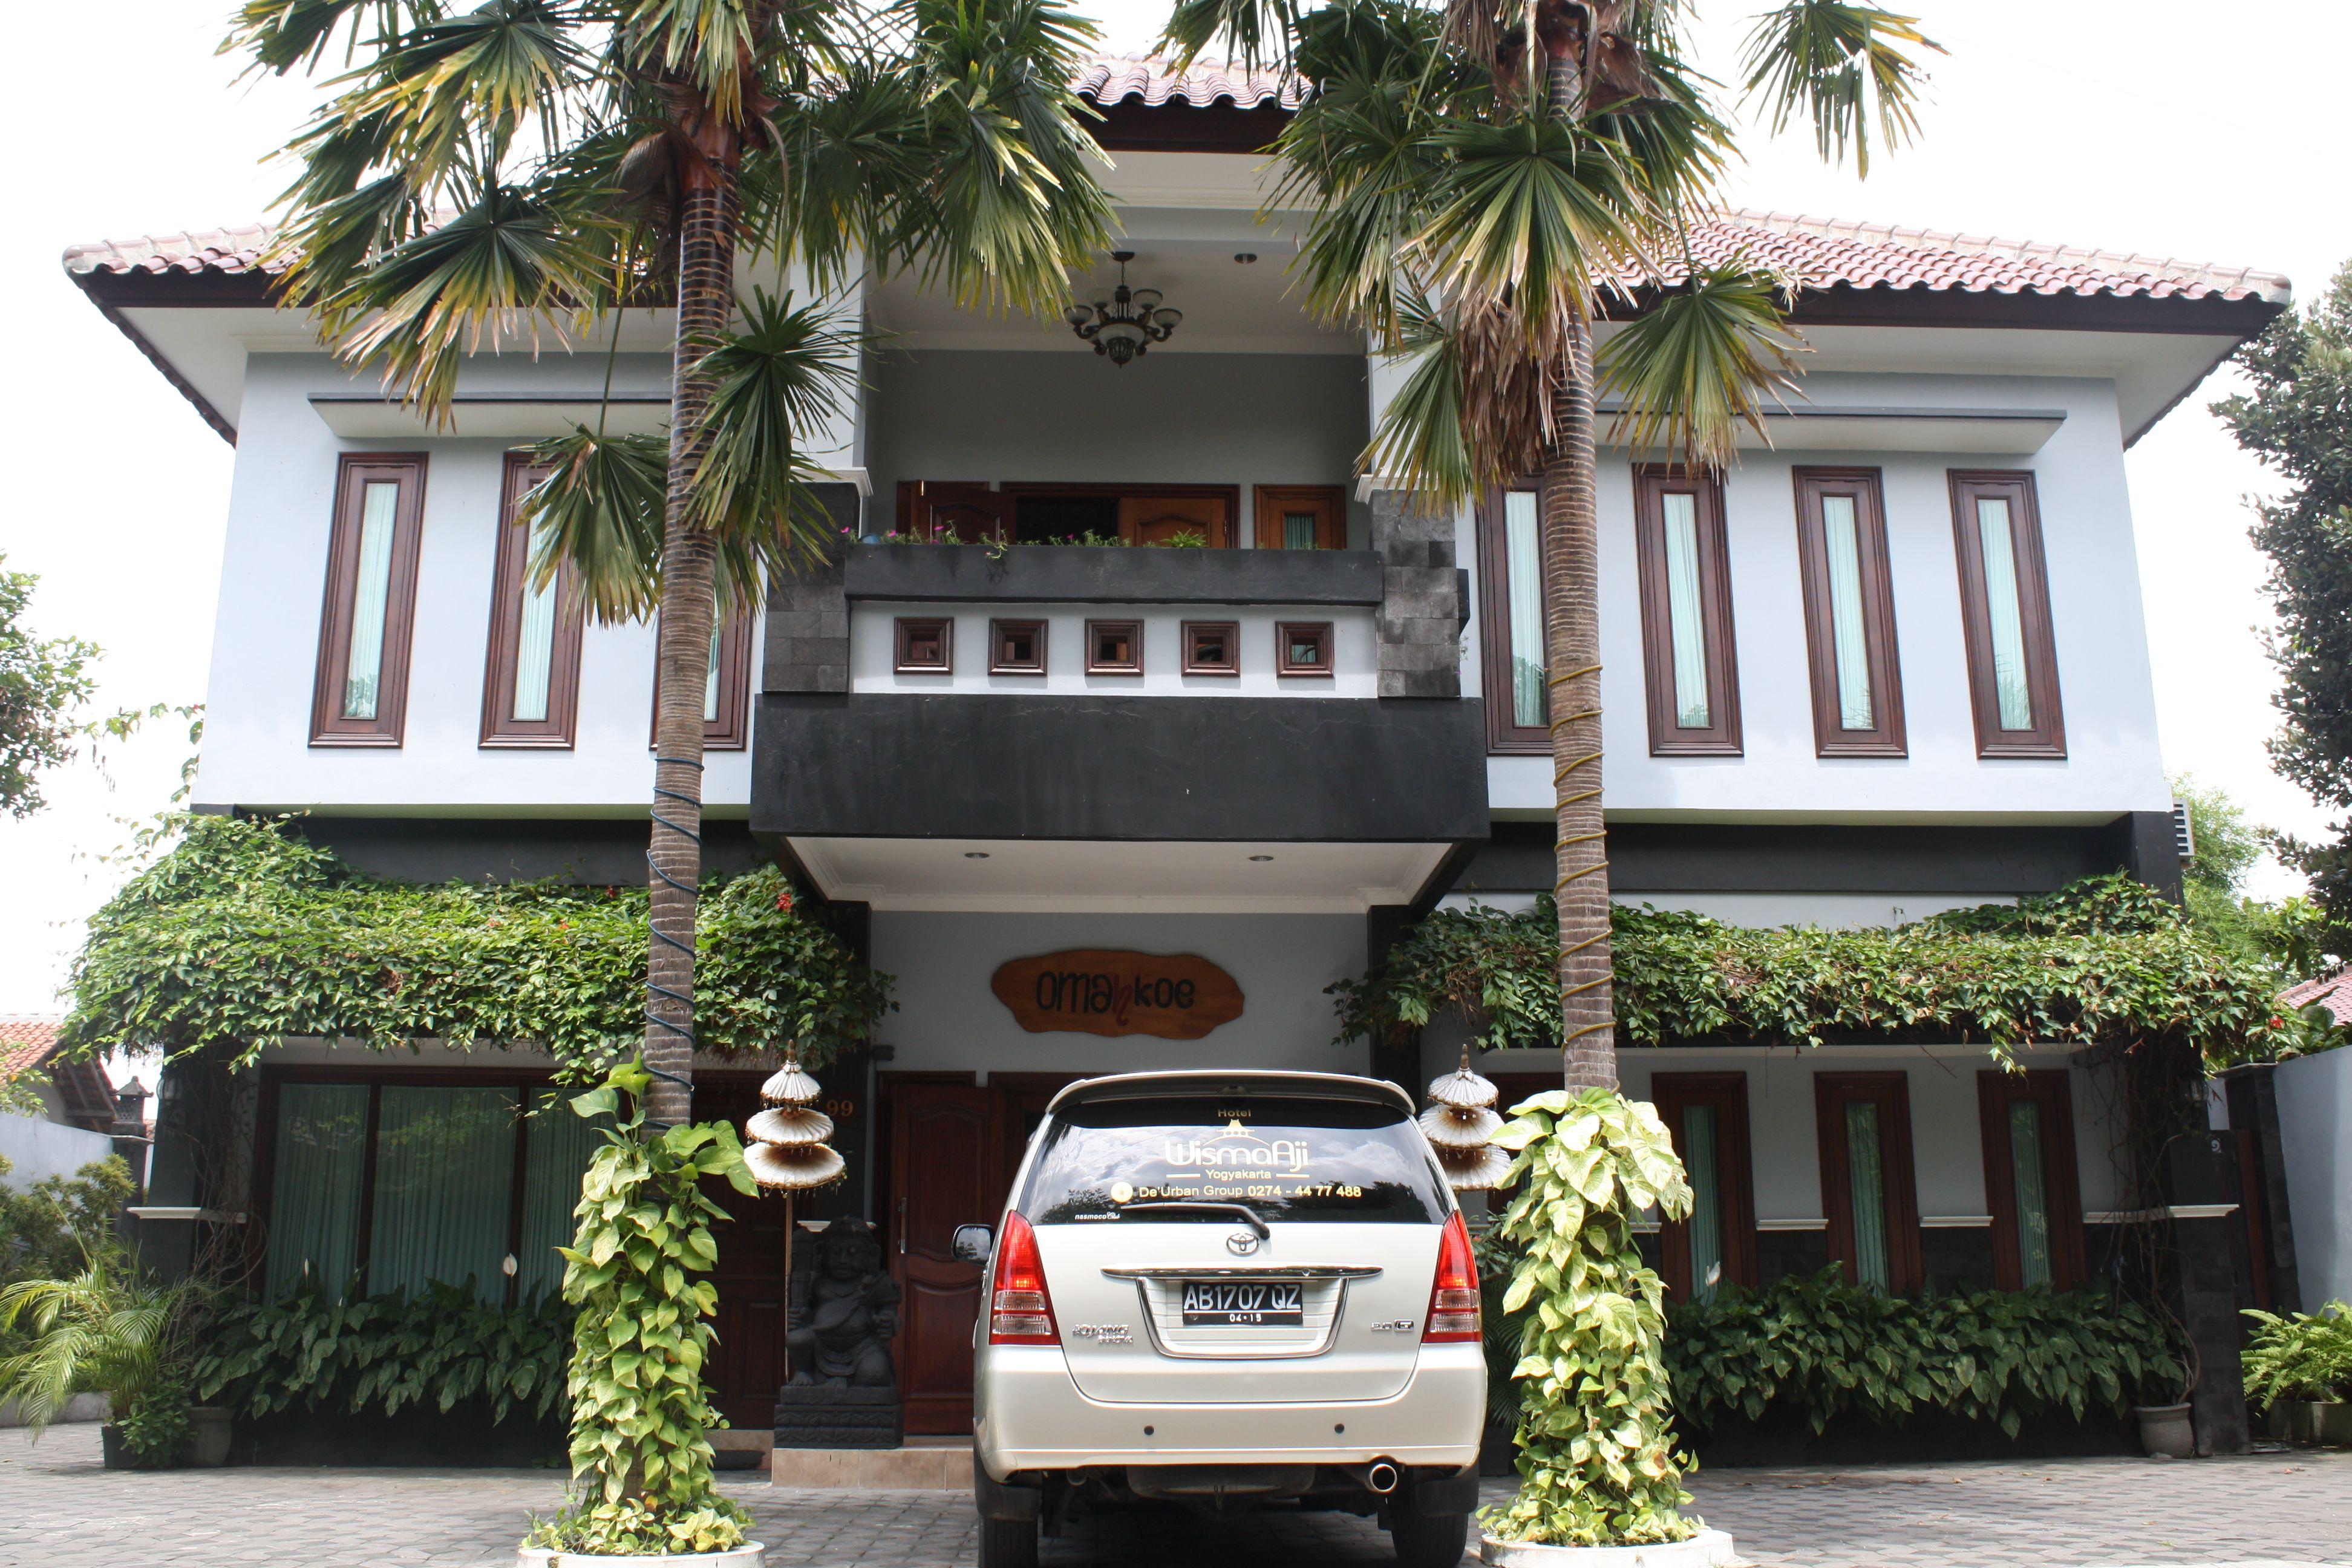 Omahkoe Guesthouse Yogyakarta